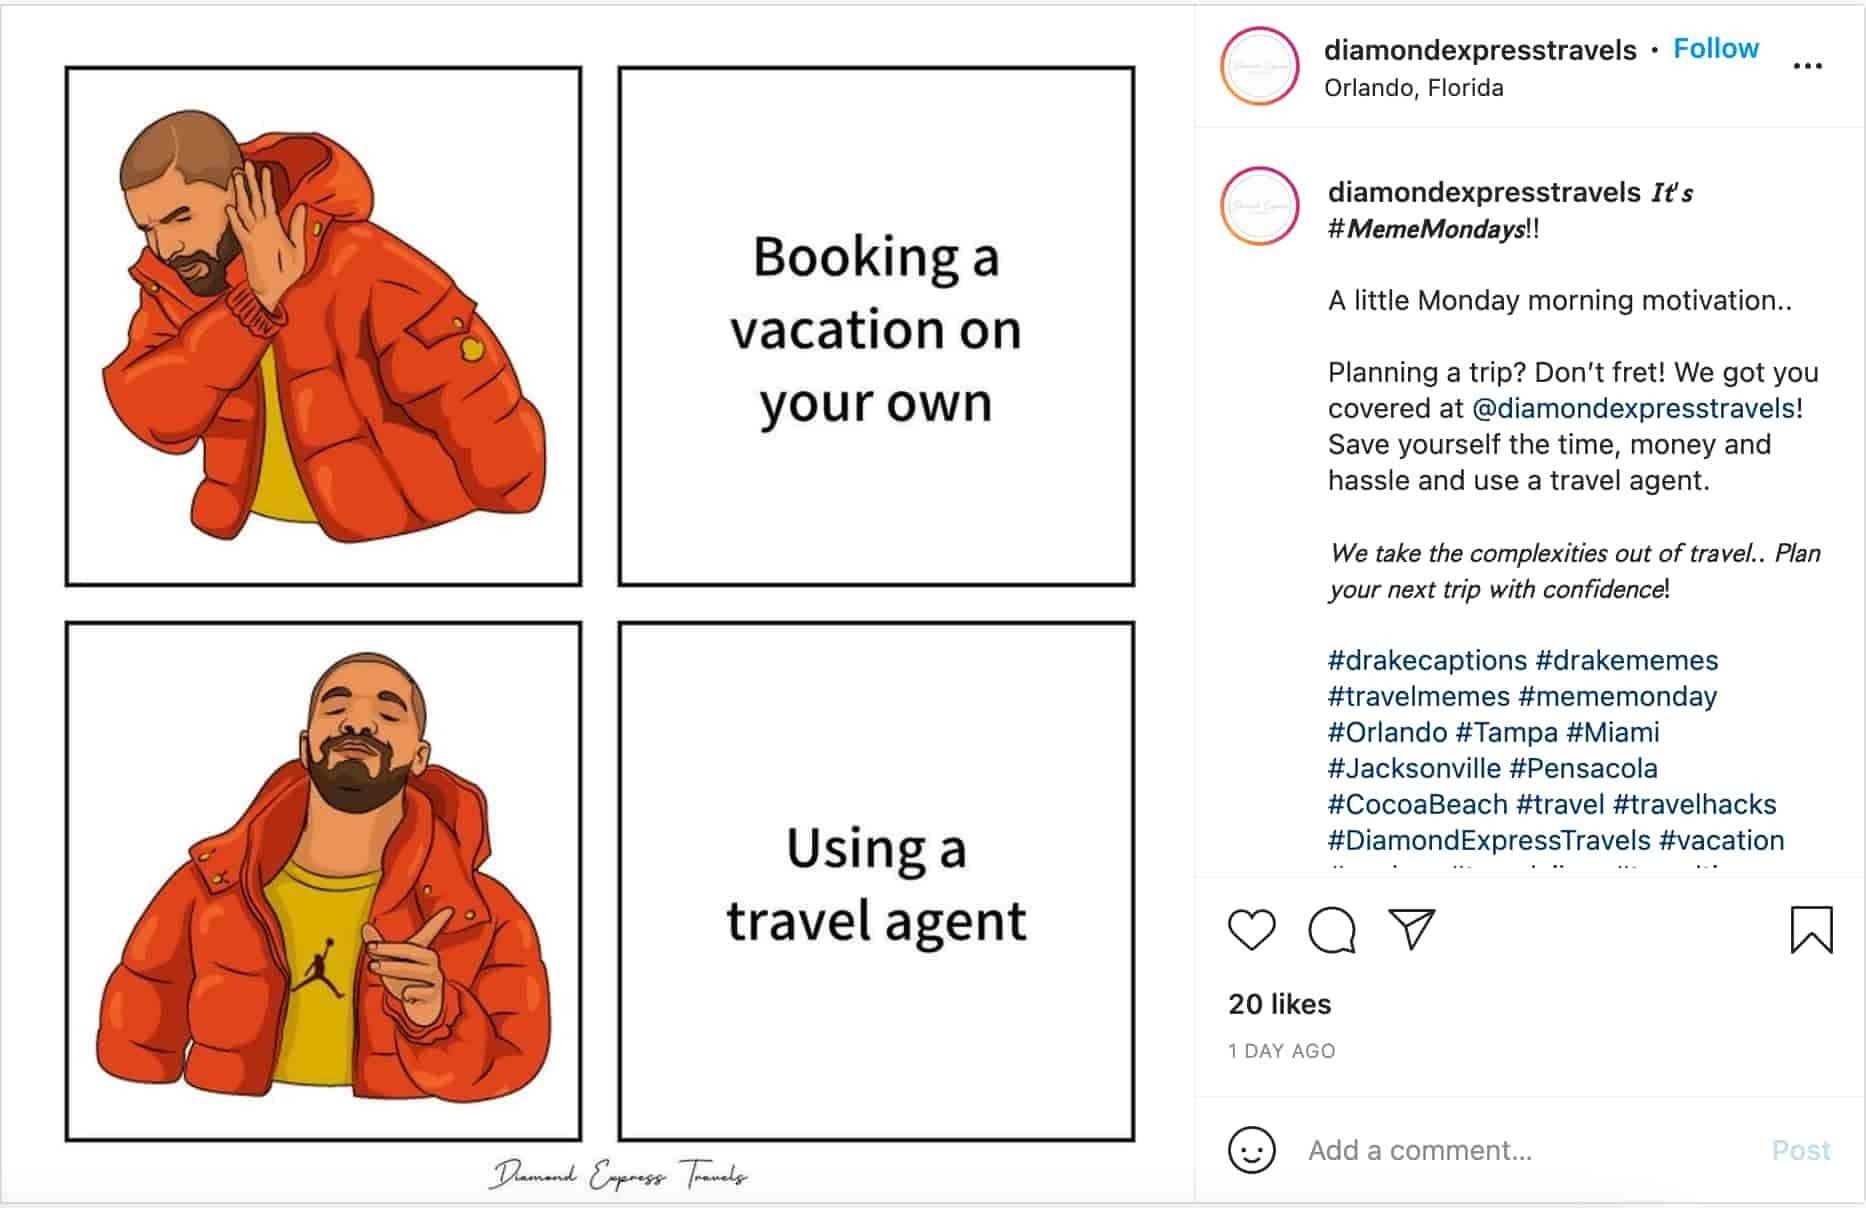 esempio di meme marketing di Diamond Express Travels